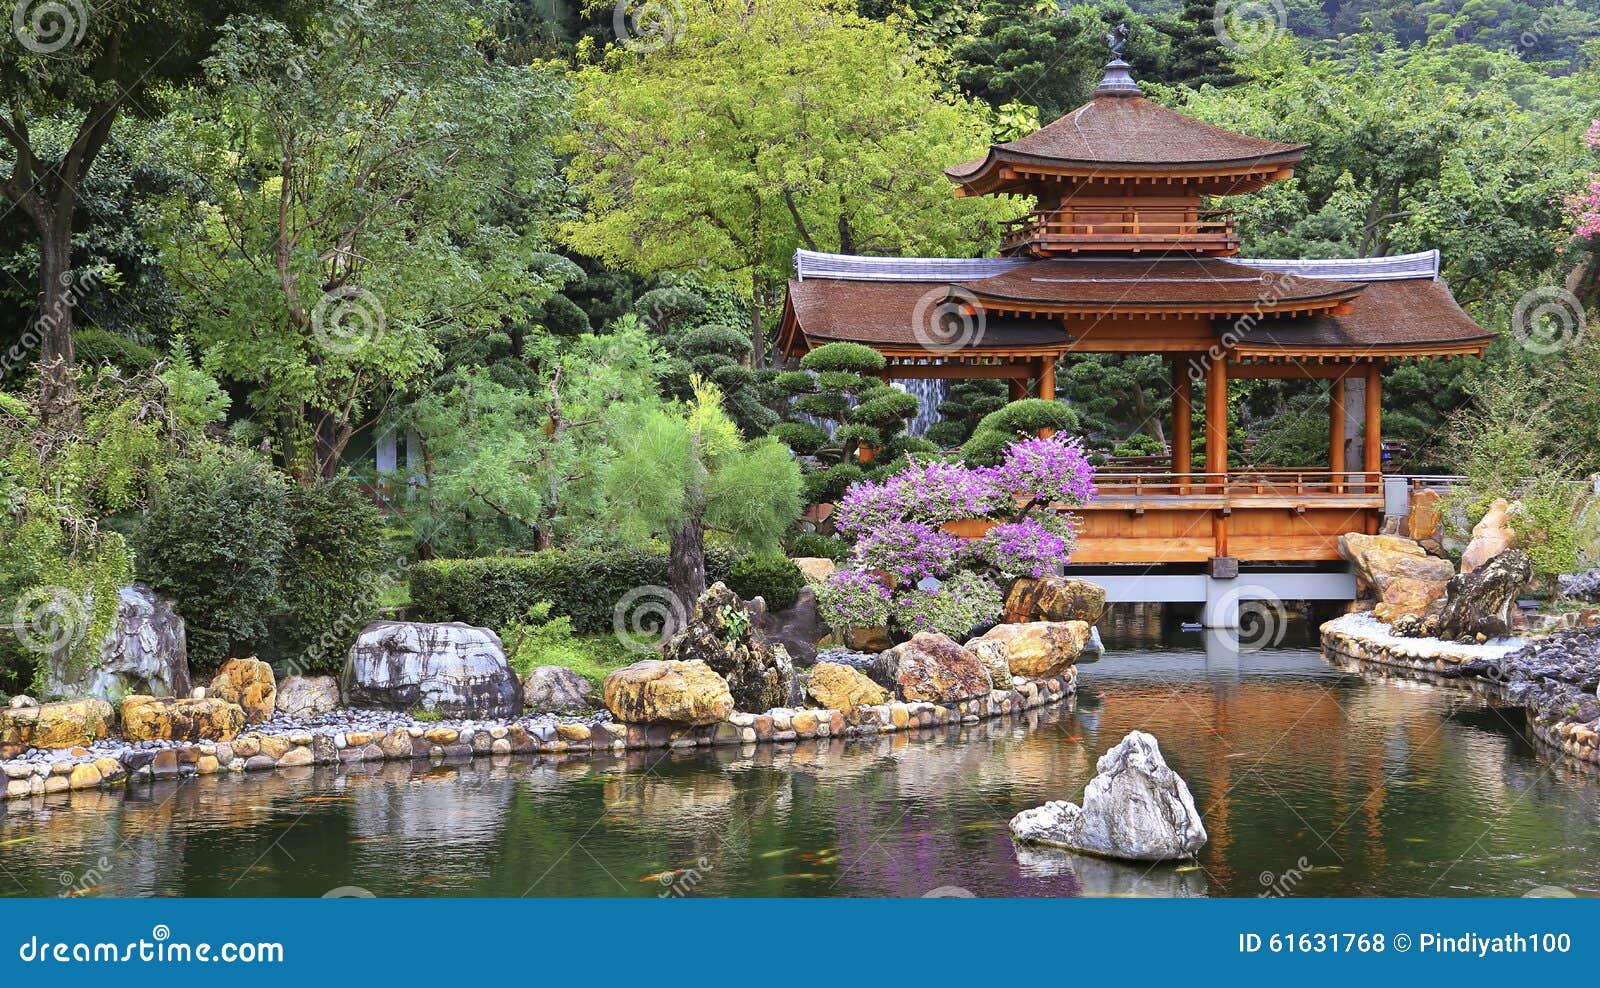 Chinese Zen Garden With Pagoda Stock Photo - Image: 61631768